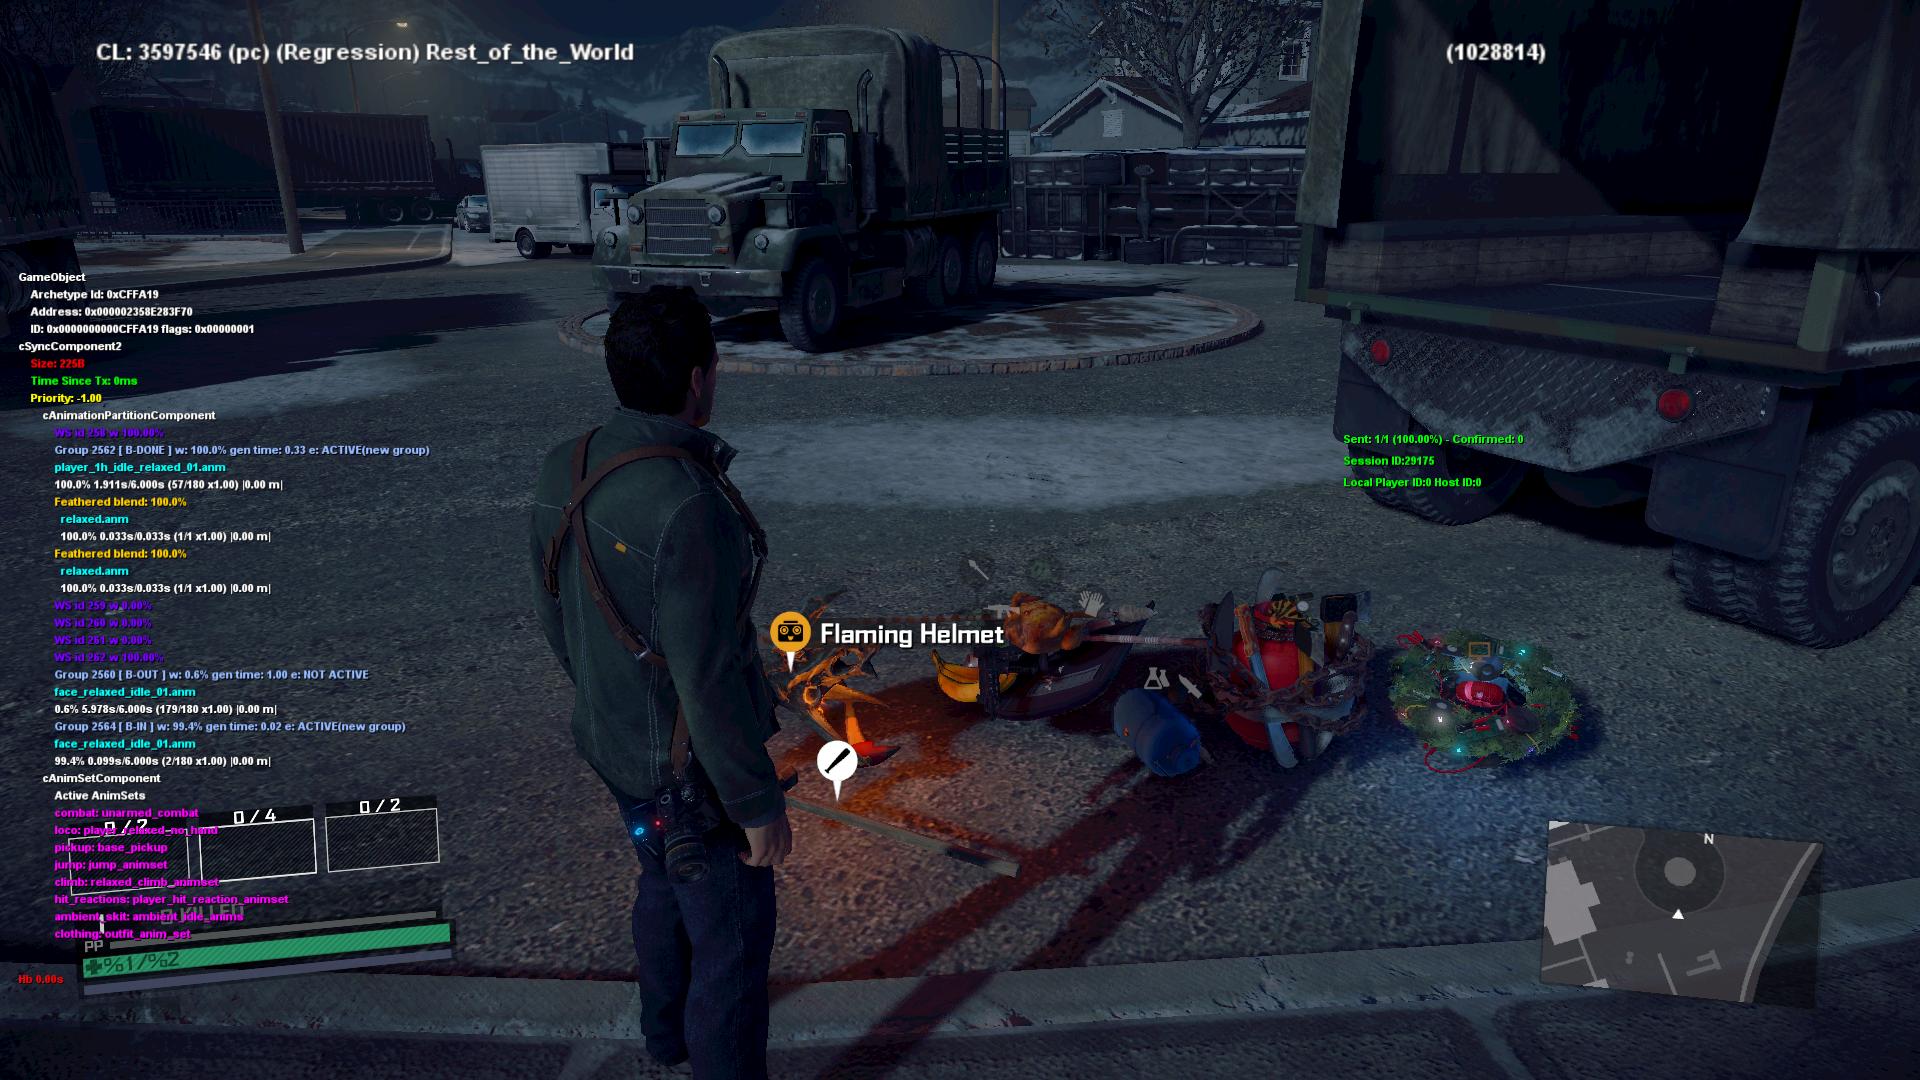 Dead Rising 4 announced for Xbox One, PC - Gematsu